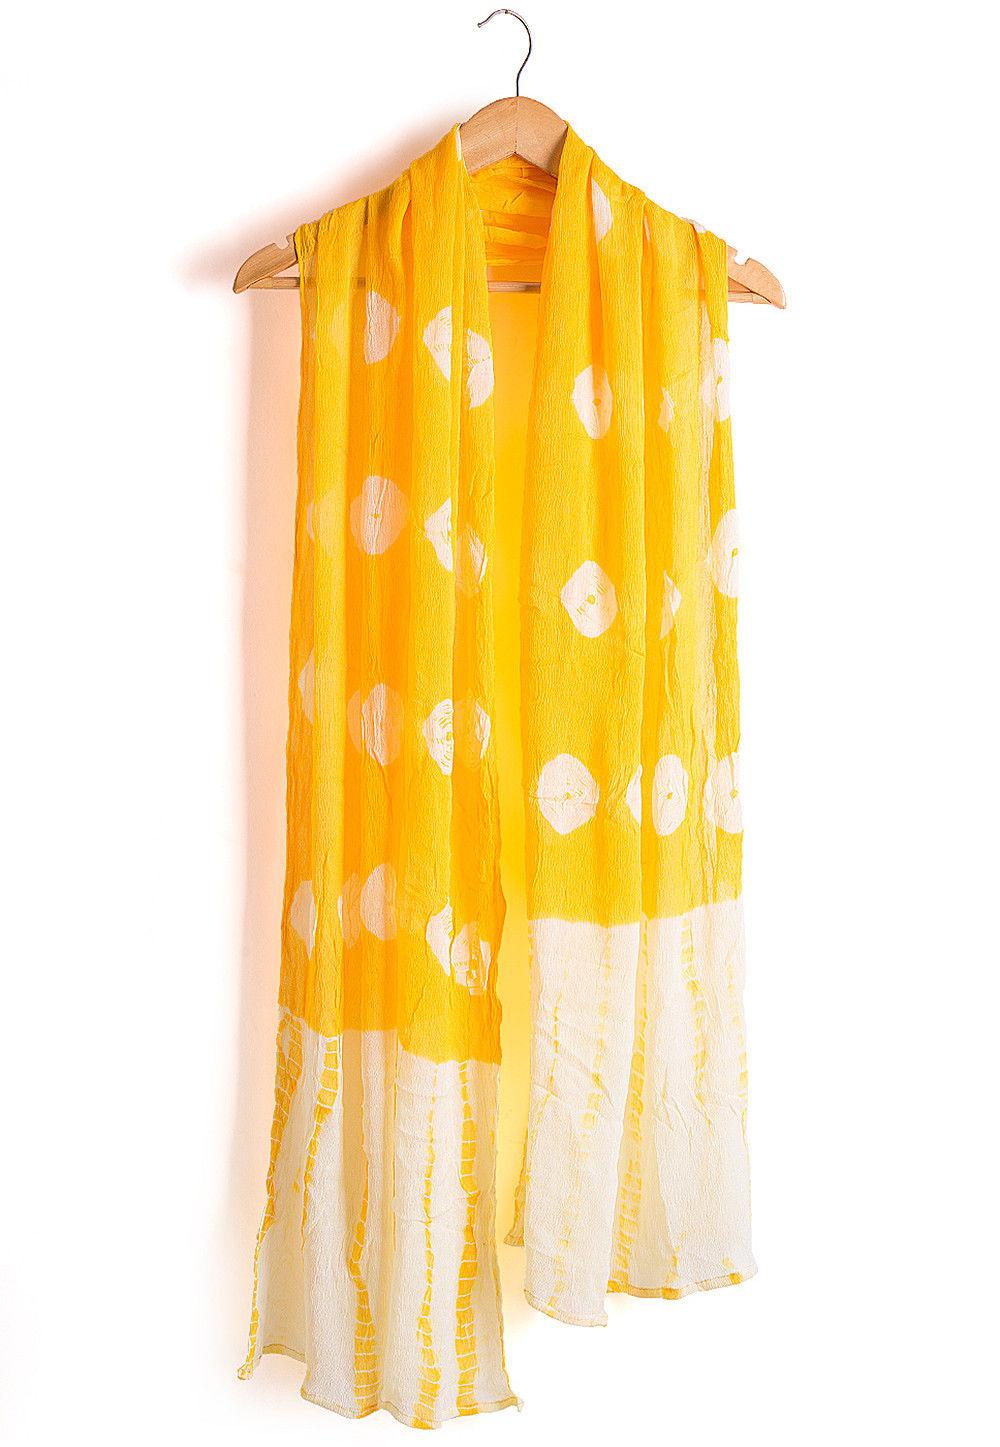 Orange and White Tie and Dye DupattaScarf